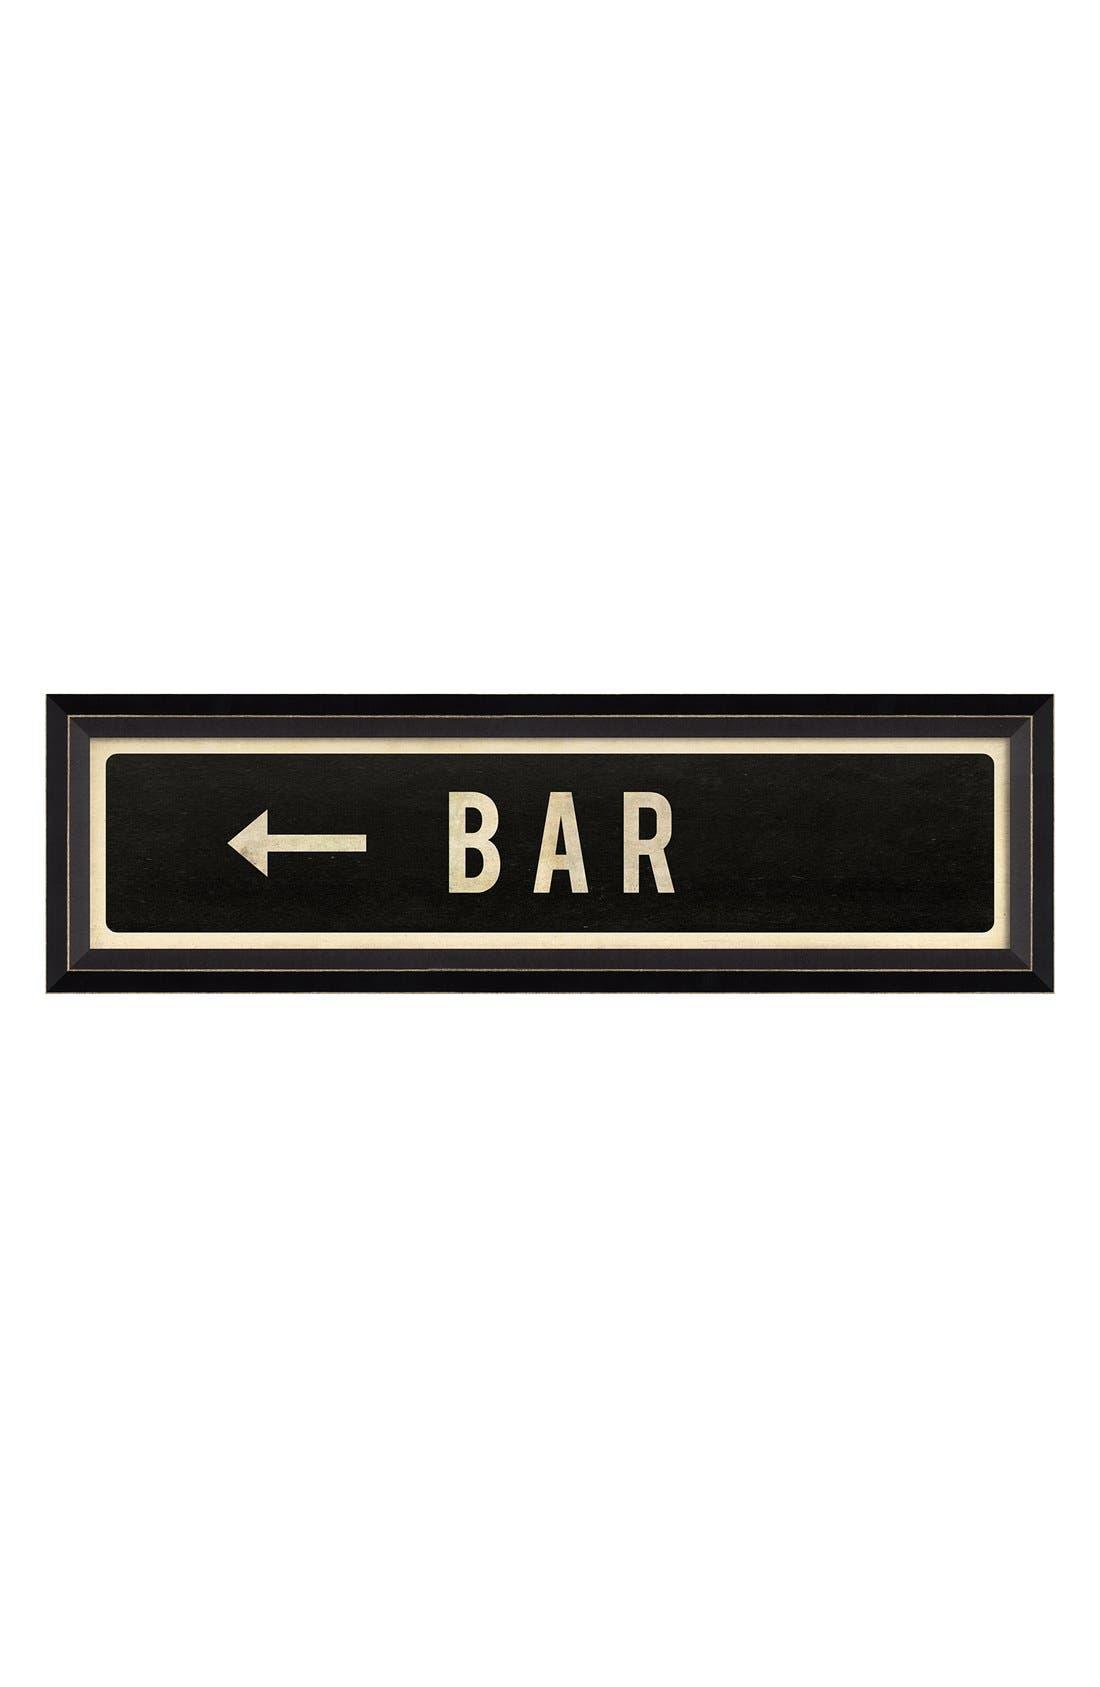 Main Image - Spicher and Company 'Bar Left' Vintage Look Street Sign Artwork